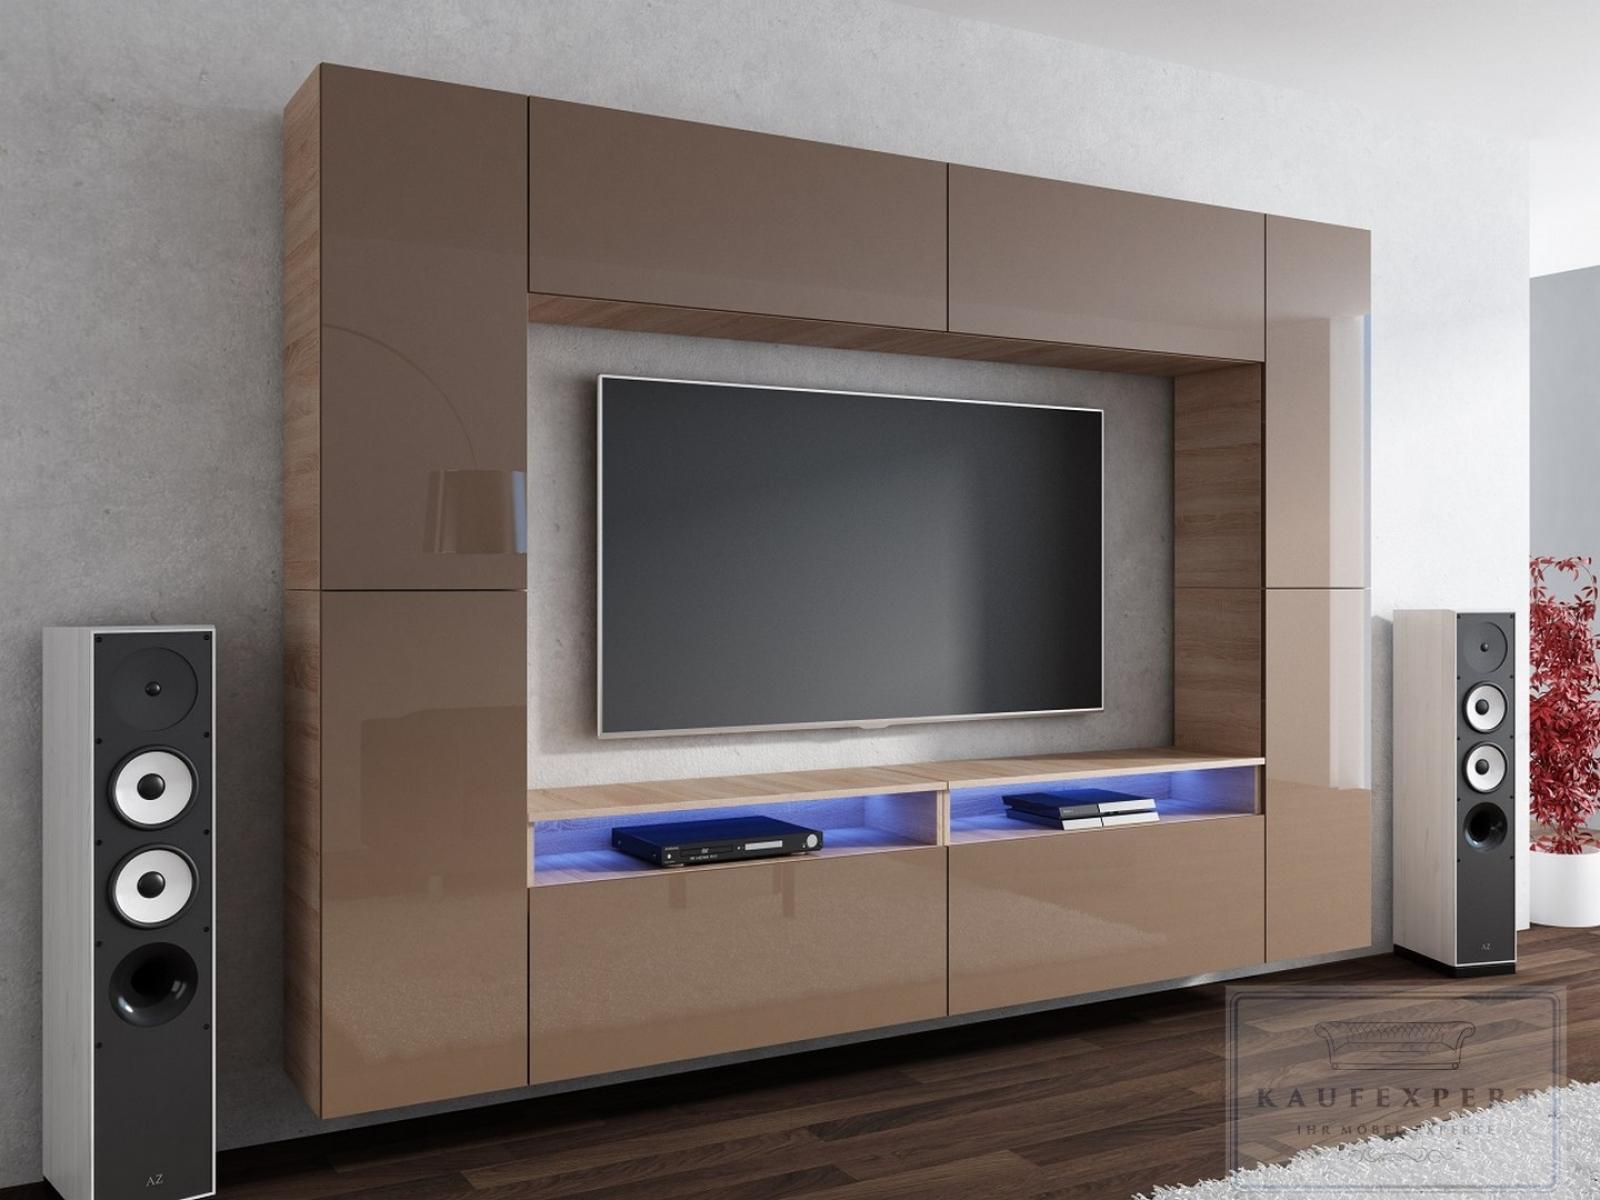 kaufexpert wohnwand cinema cappuccino hochglanz sonoma eiche 280 cm mediawand medienwand. Black Bedroom Furniture Sets. Home Design Ideas